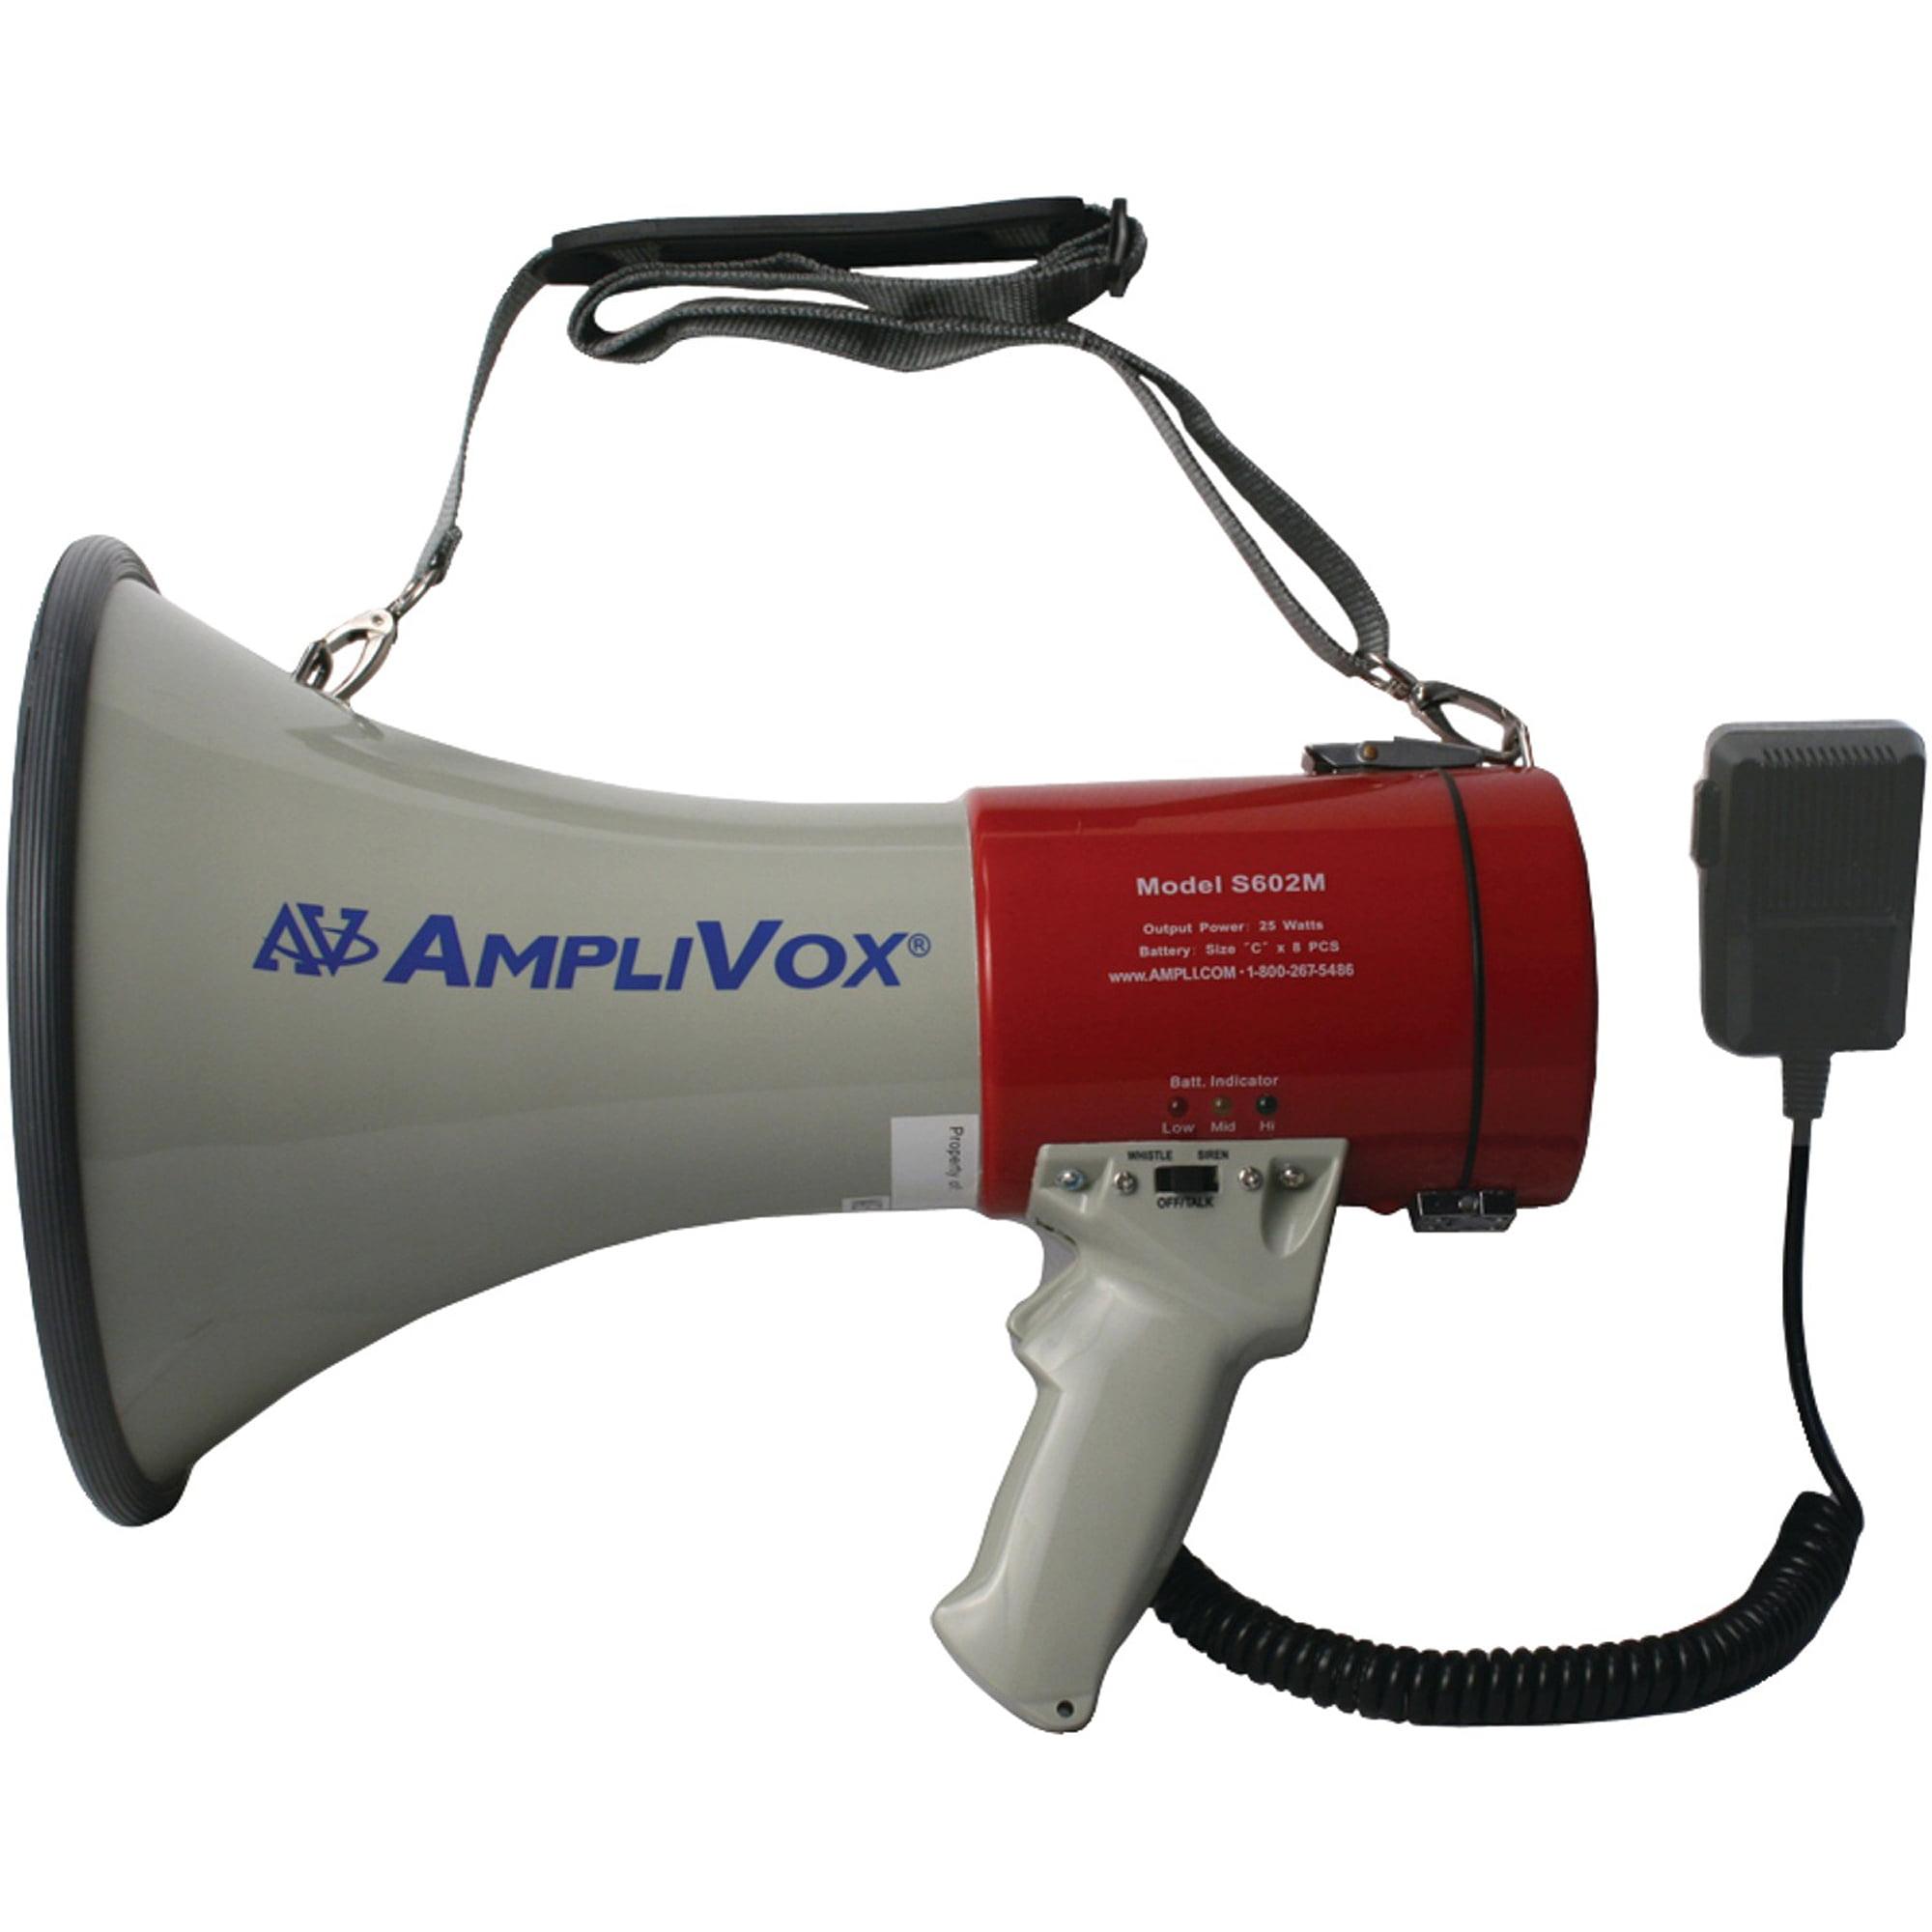 Amplivox S602MR Mity-Meg Plus 25W Megaphone